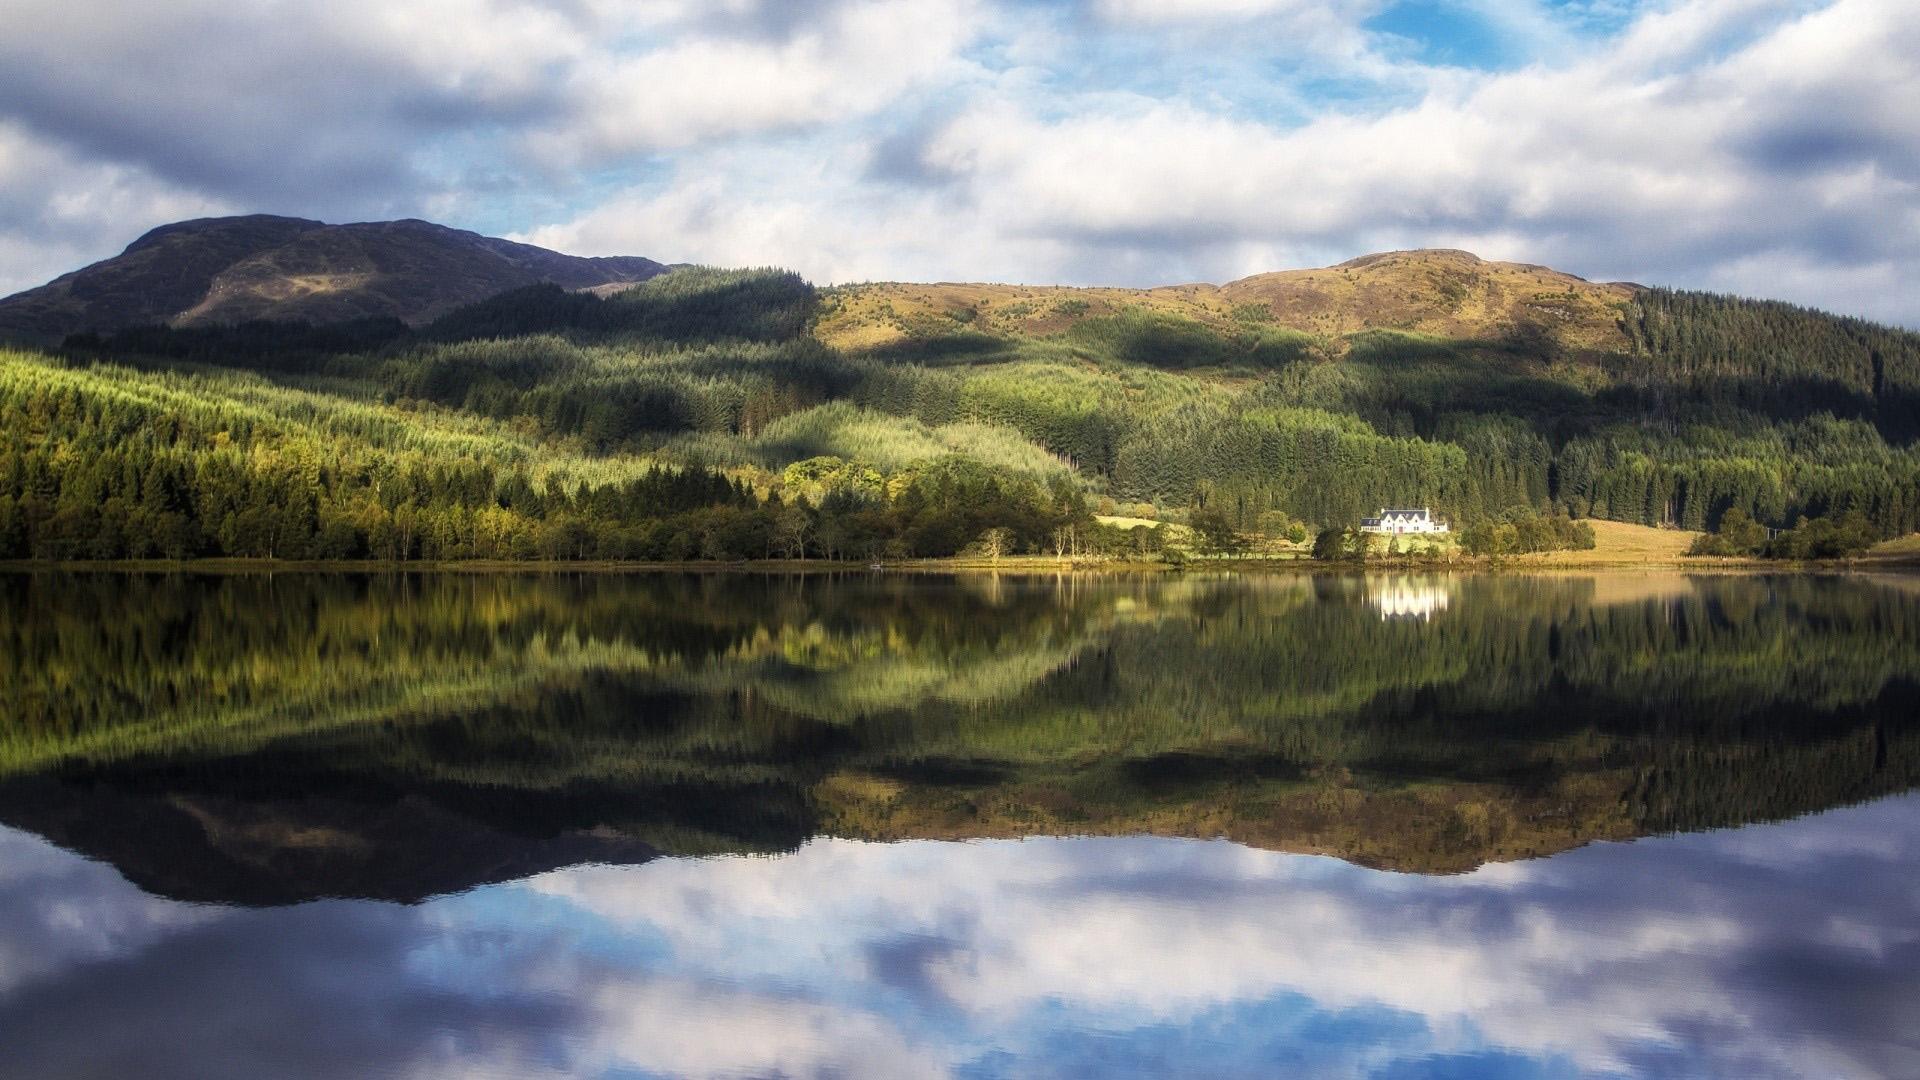 Wallpaper Loch Chon at Trossachs in Scotland